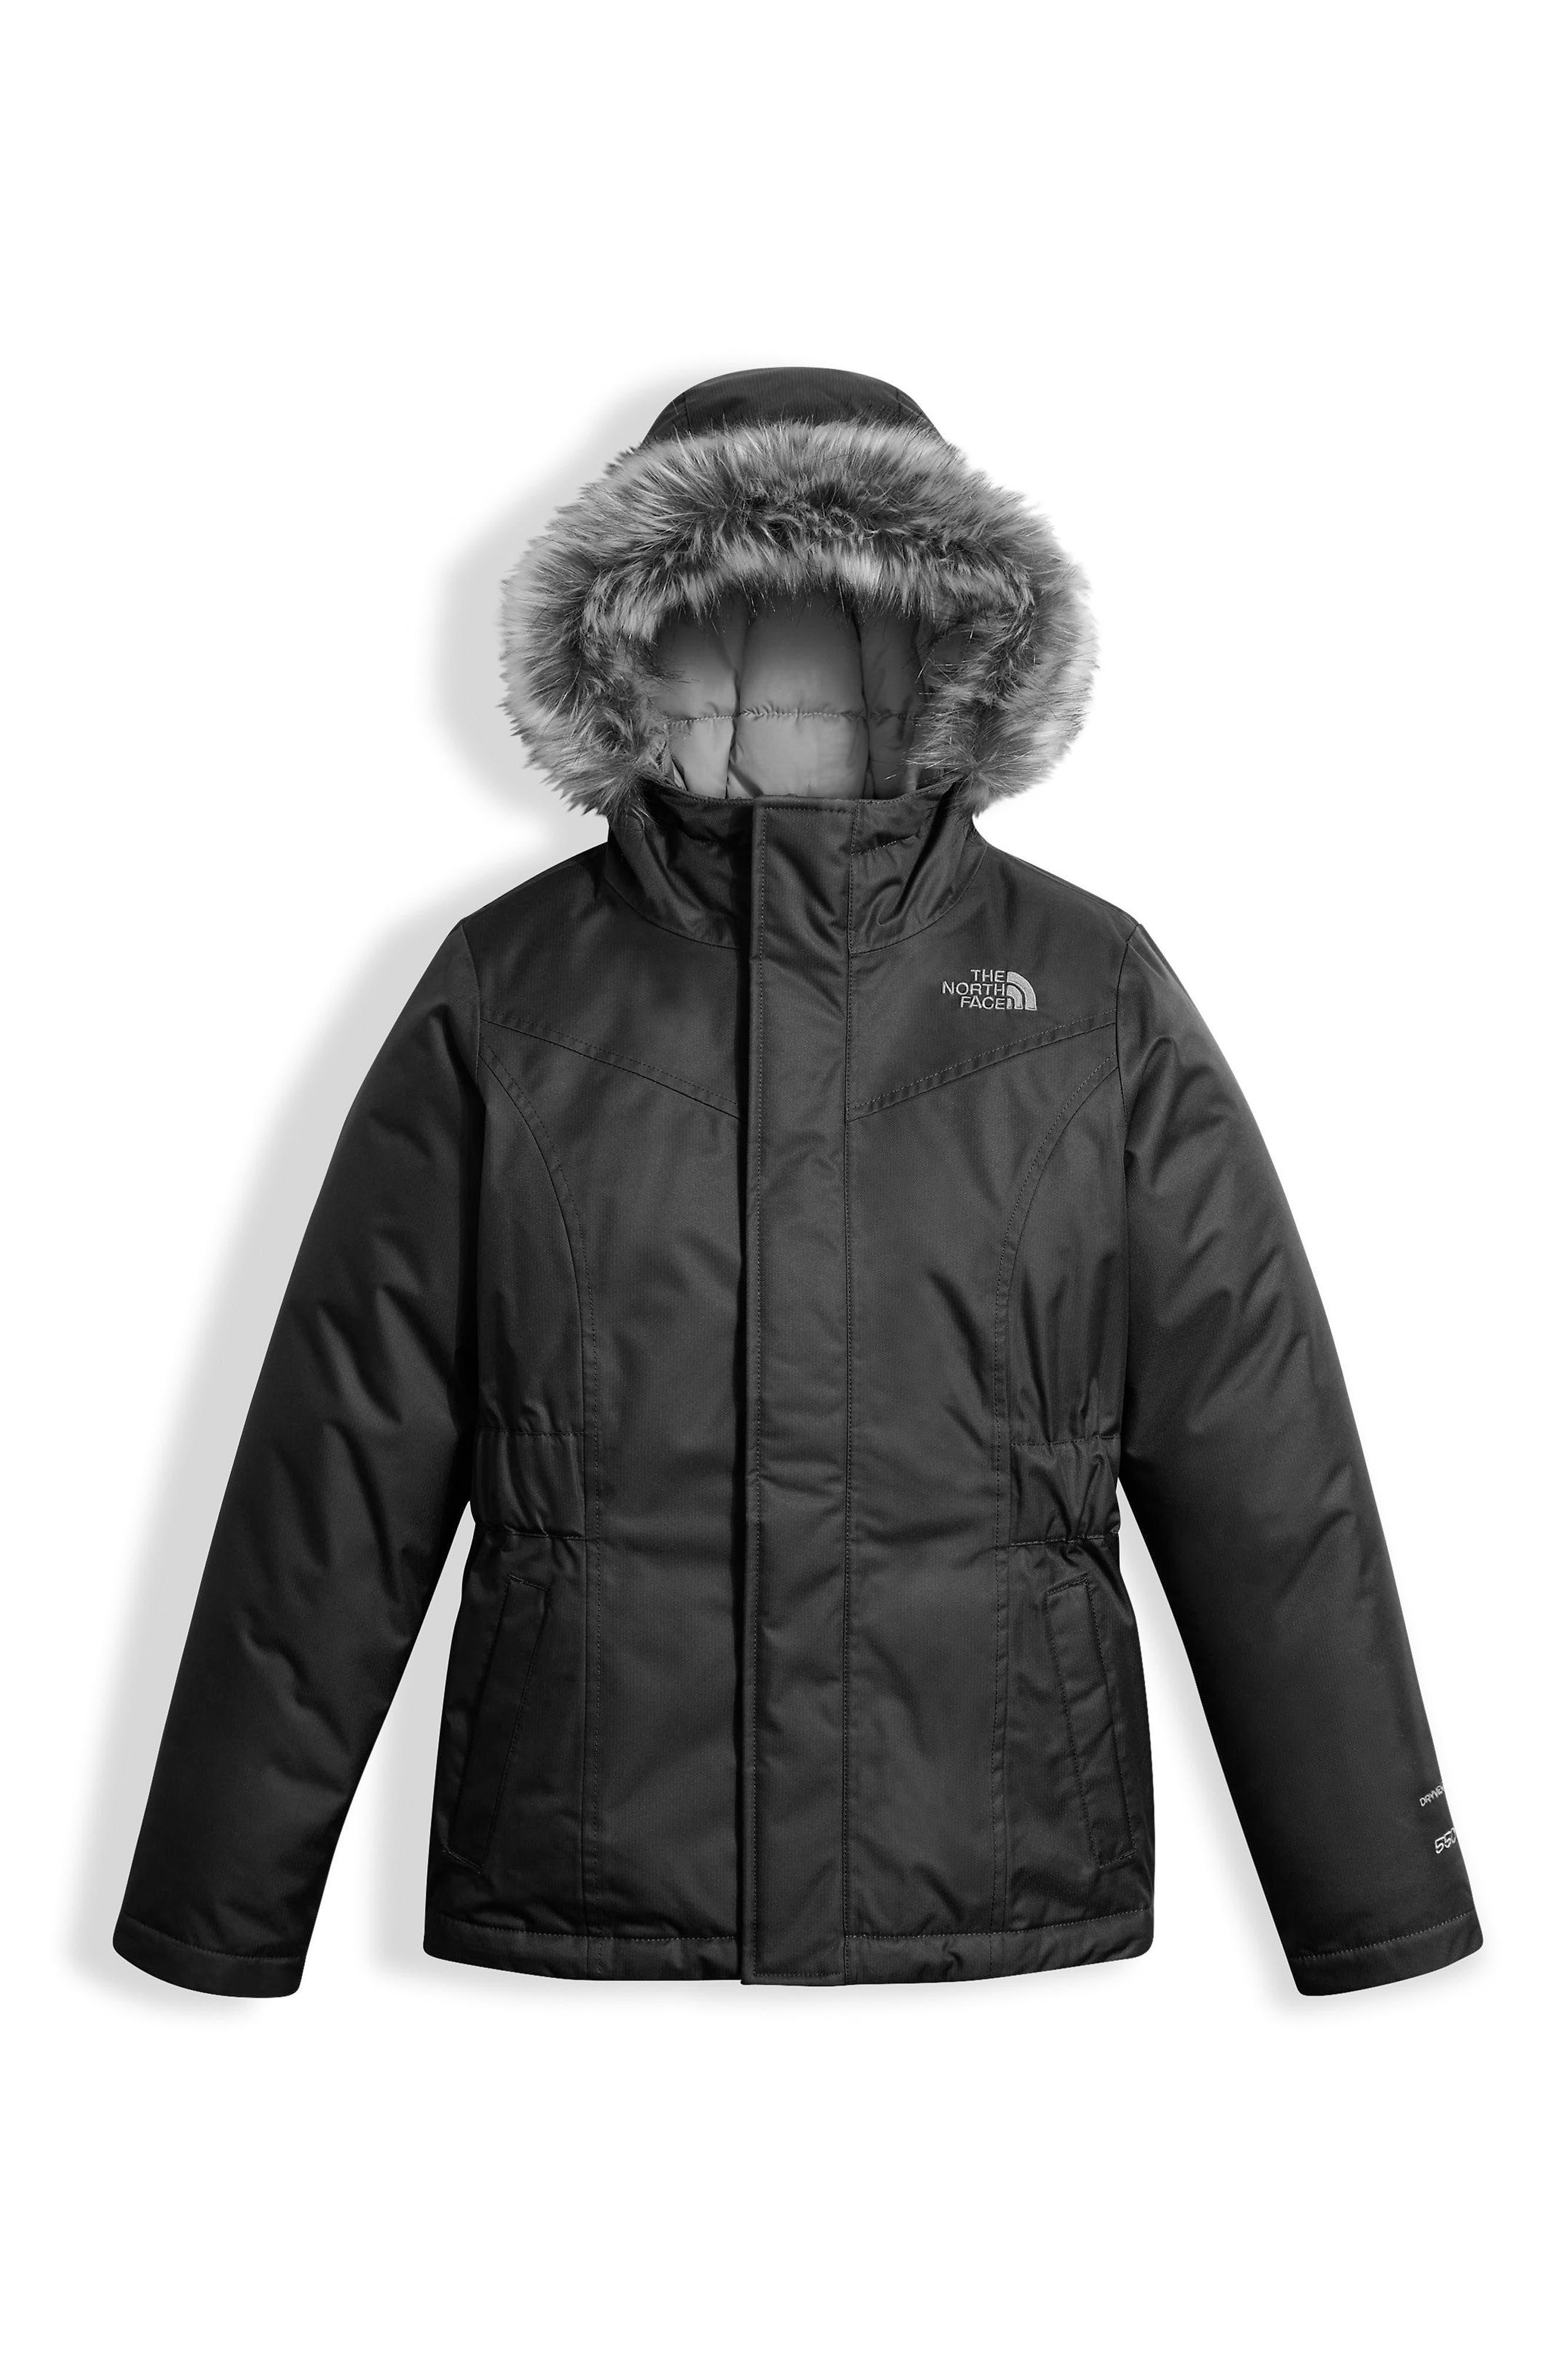 Greenland Waterproof 550-Fill Down Jacket,                             Main thumbnail 1, color,                             Tnf Black